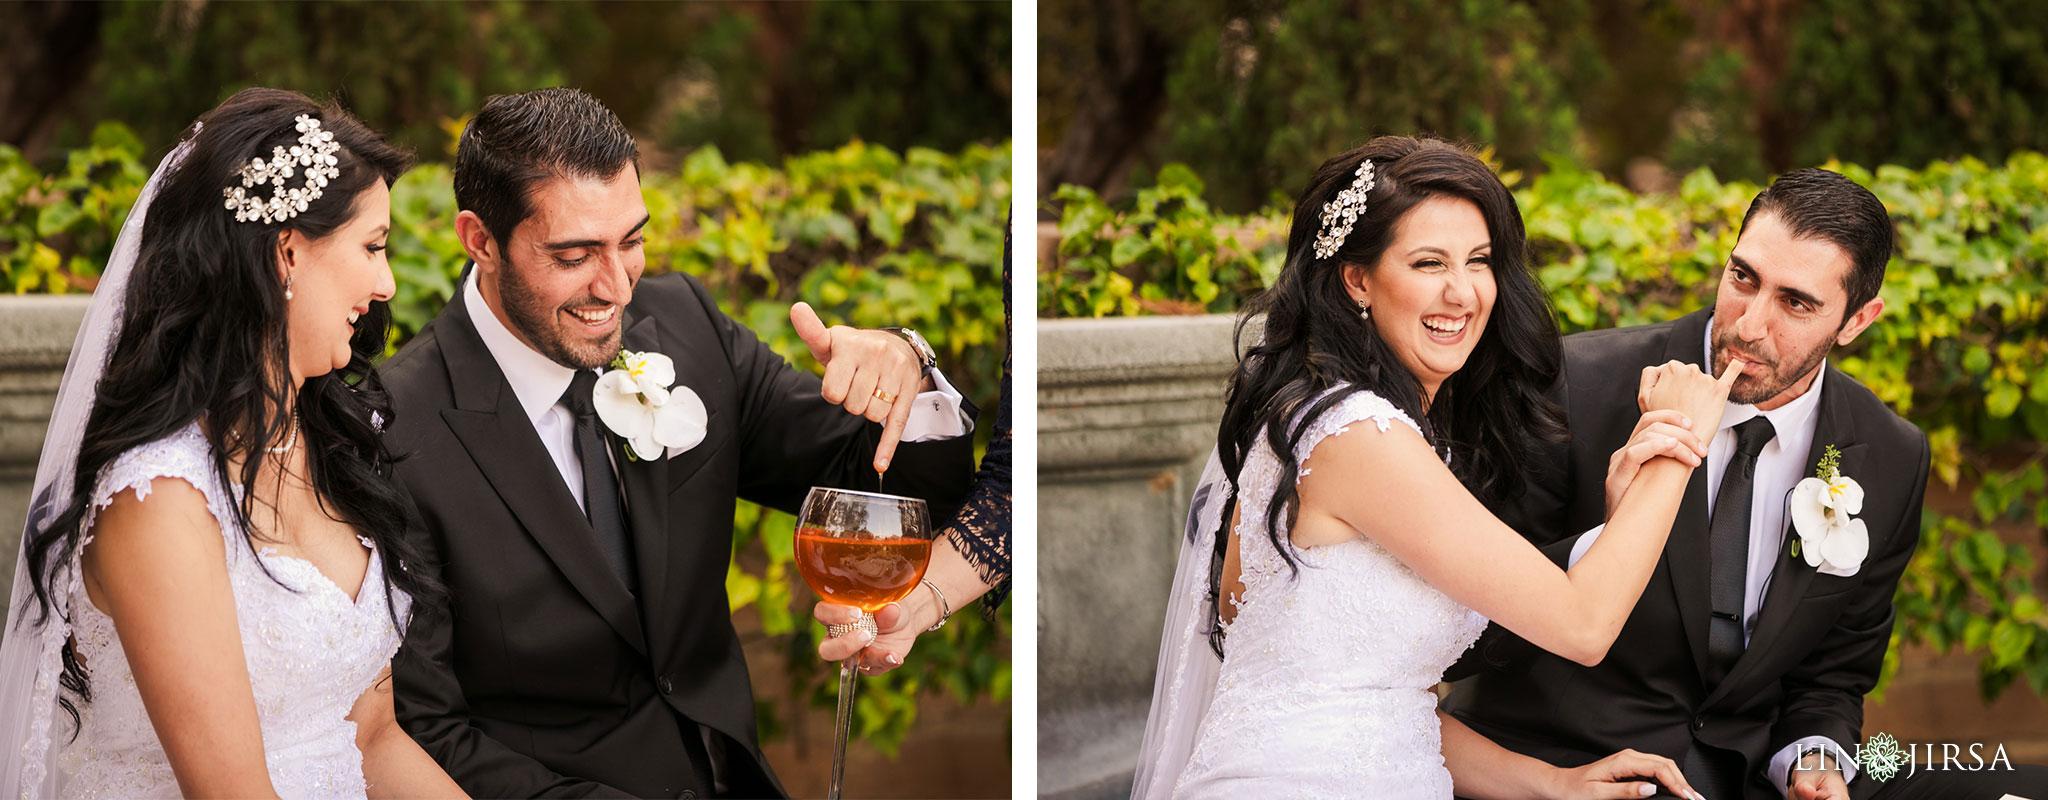 034 estancia la jolla hotel spa persian sofreh wedding ceremony photography